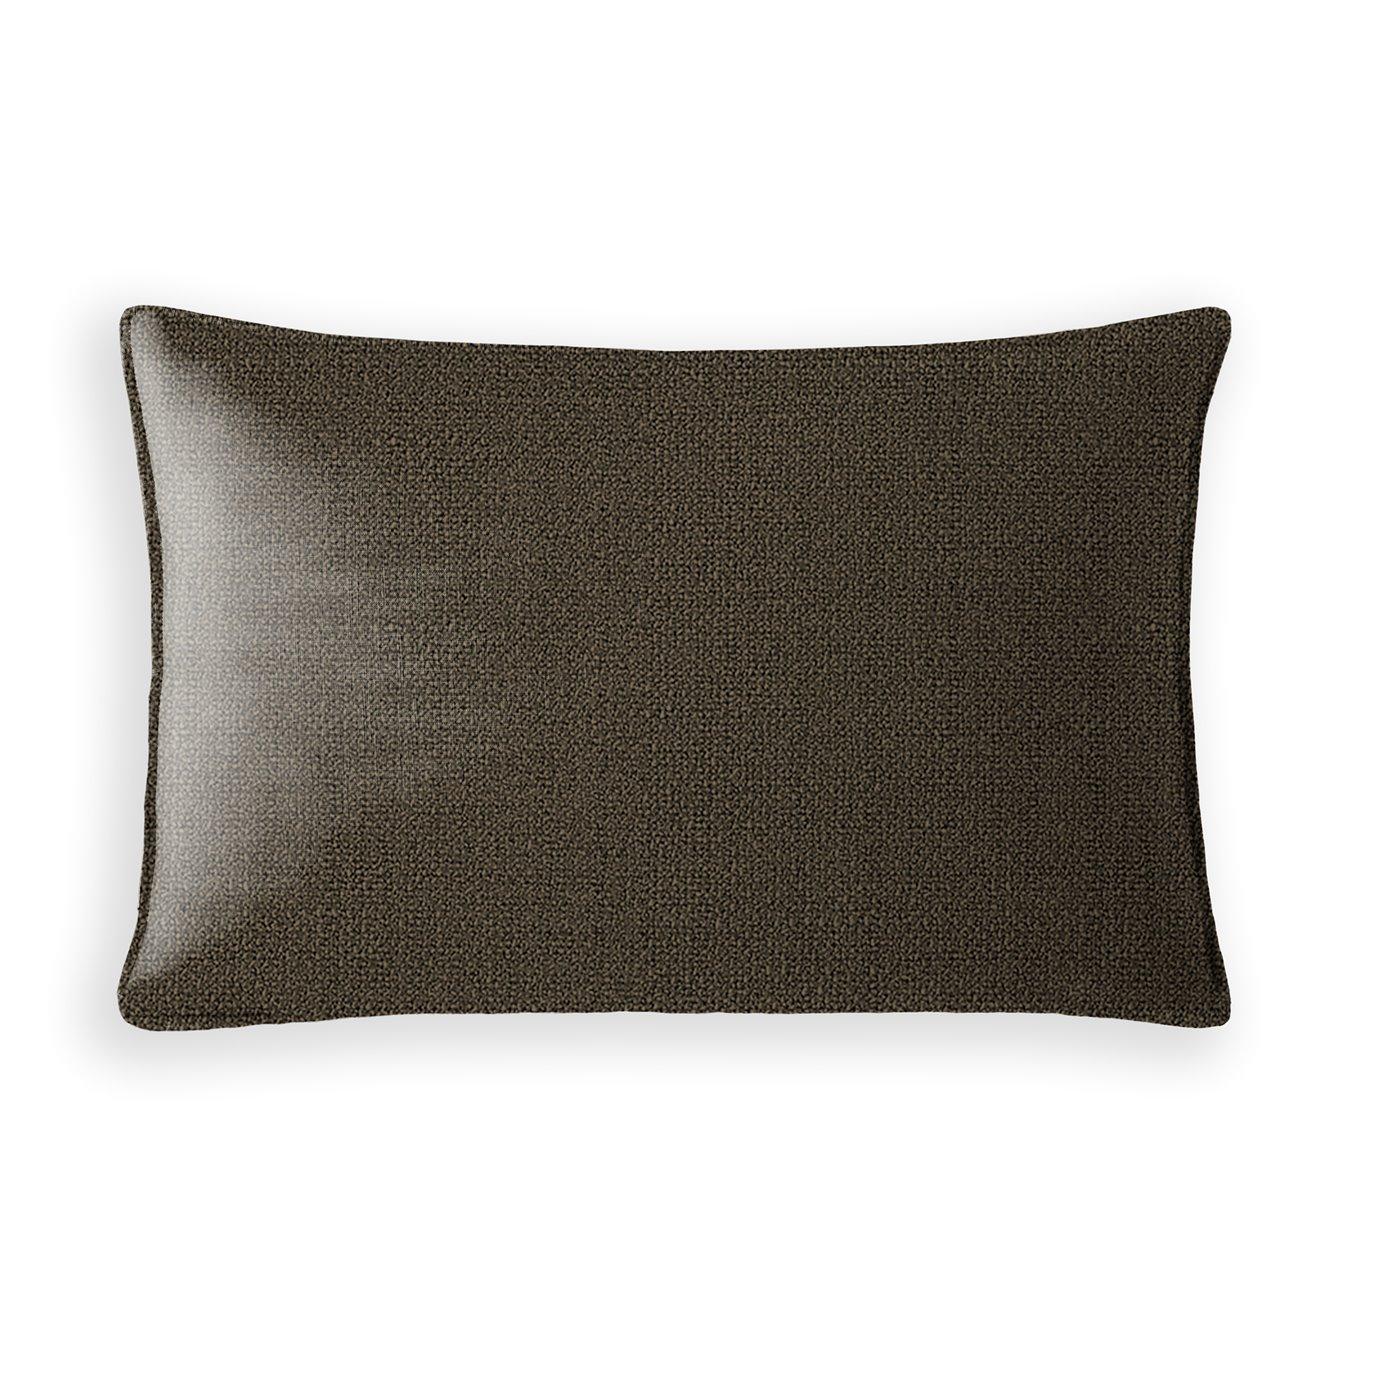 Hickory Lane Decorative Cushion - Coordinating Boucl  - Long Rectangle